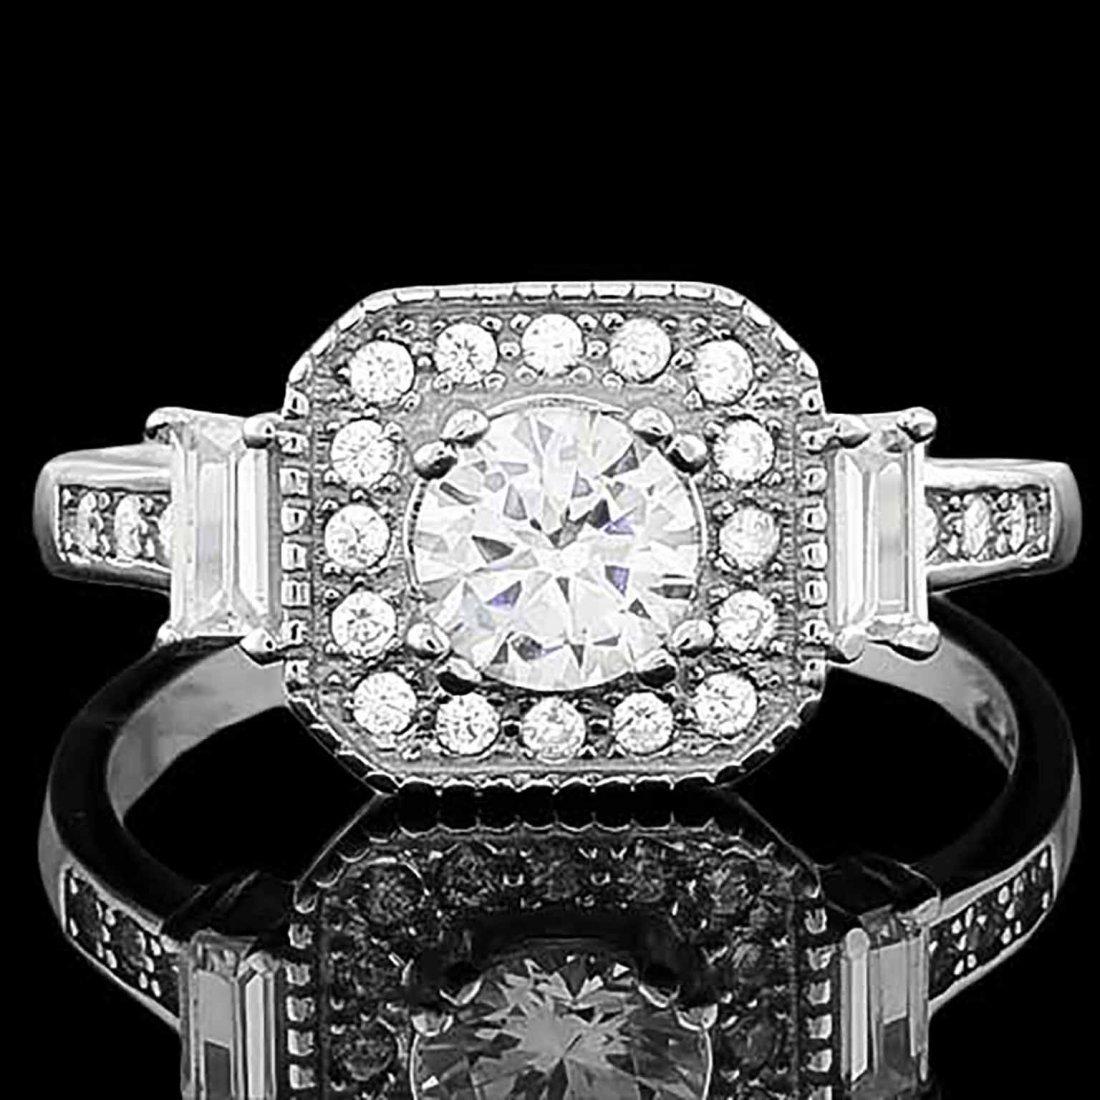 Diamond Halo Ring with a .80 Carat Diamond Center Stone